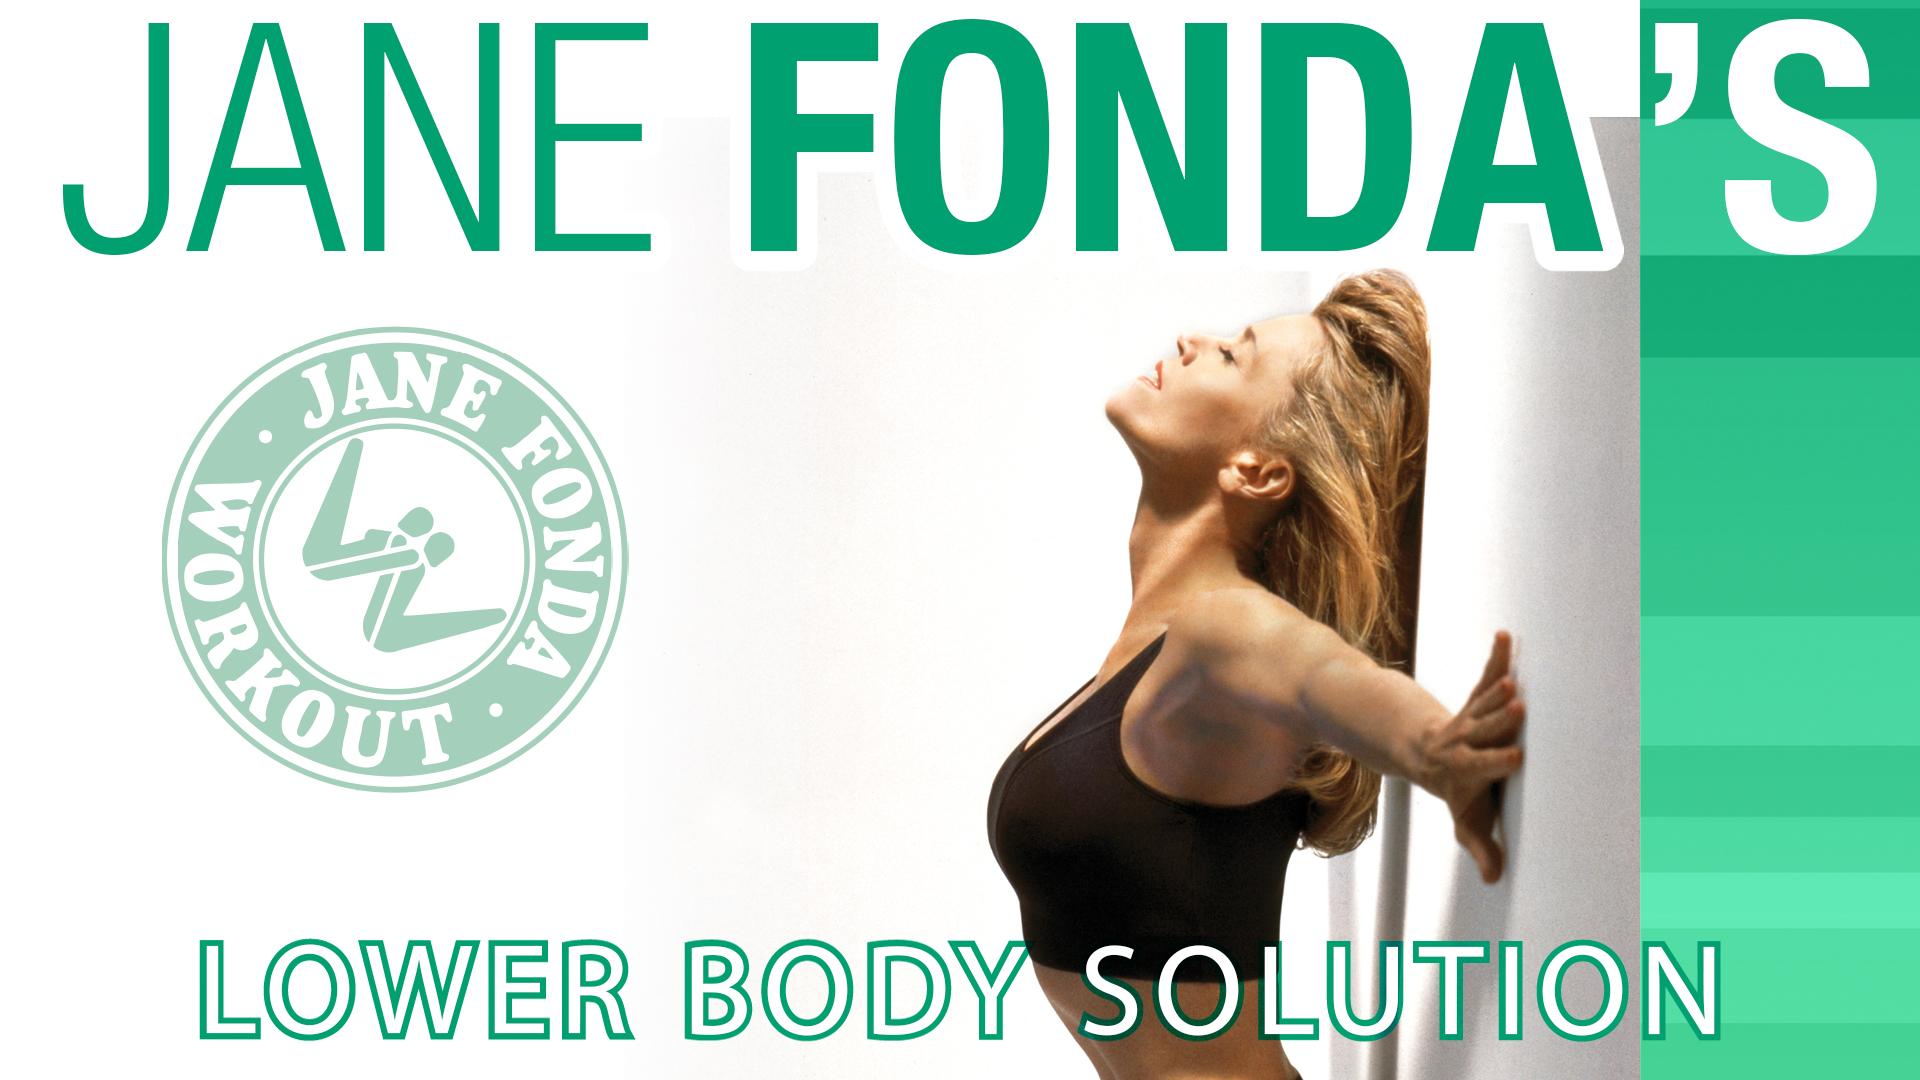 Jane Fonda's Lower Body Solution